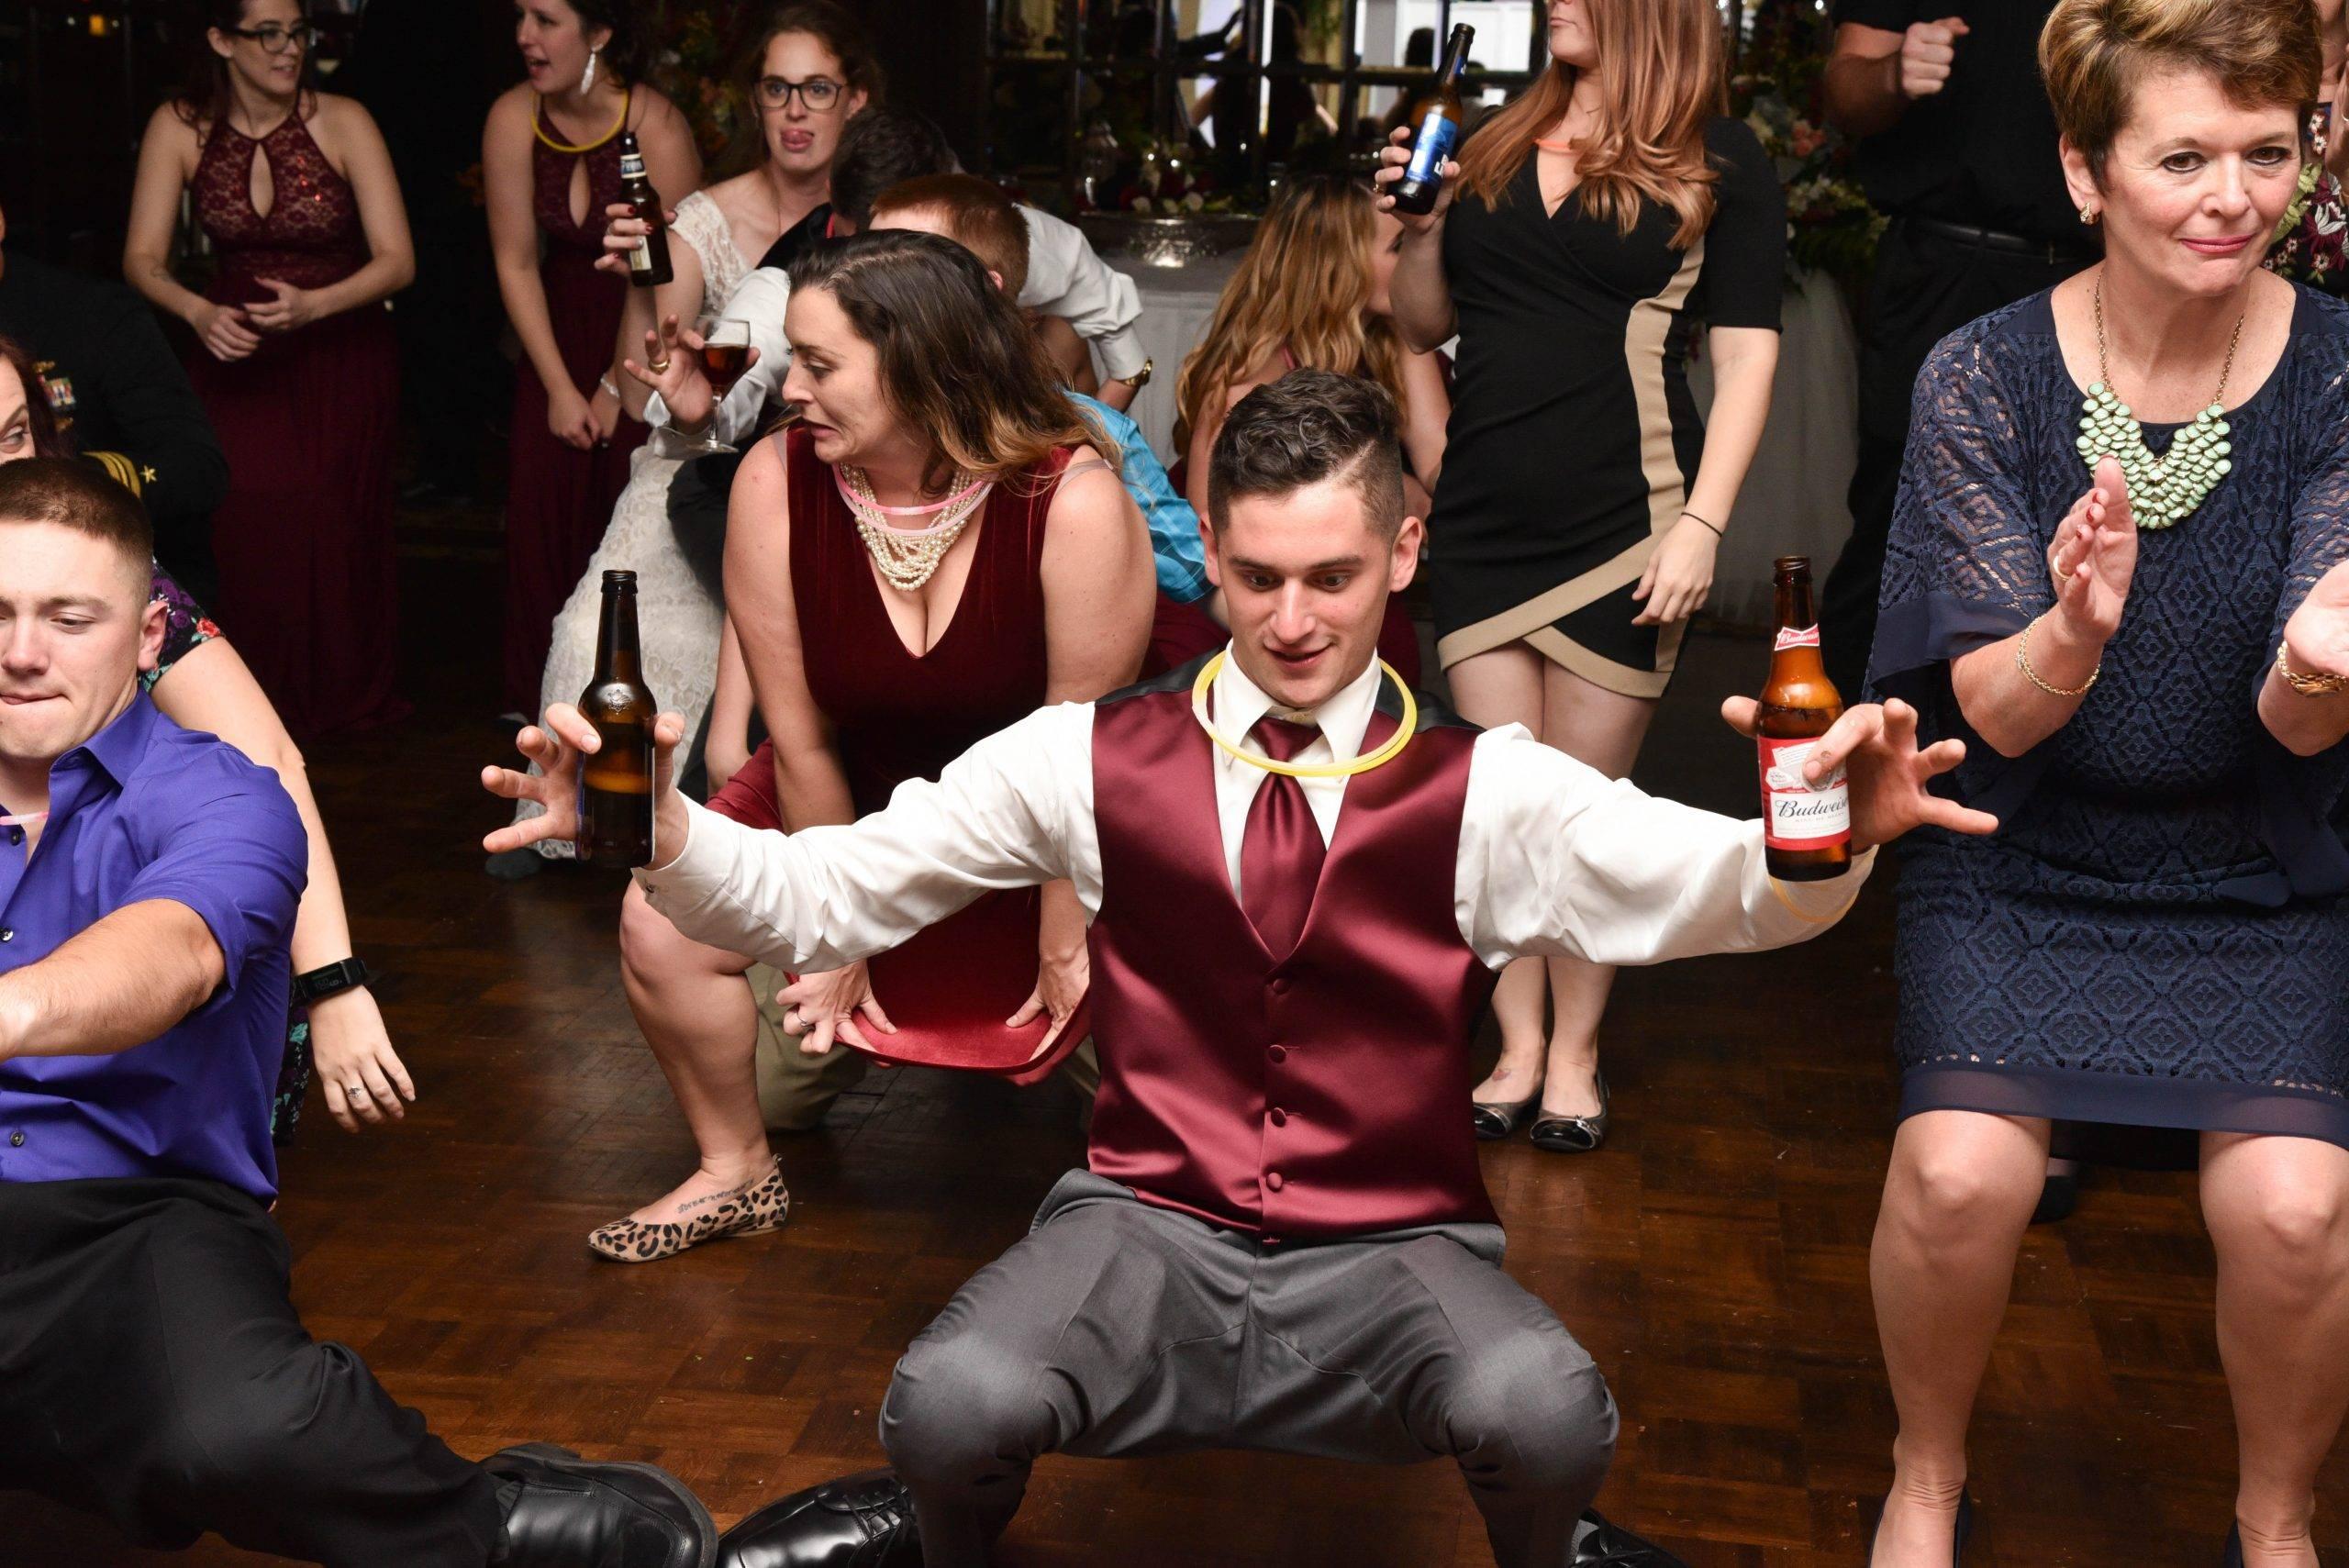 Birchwood Manor groomsman dancing